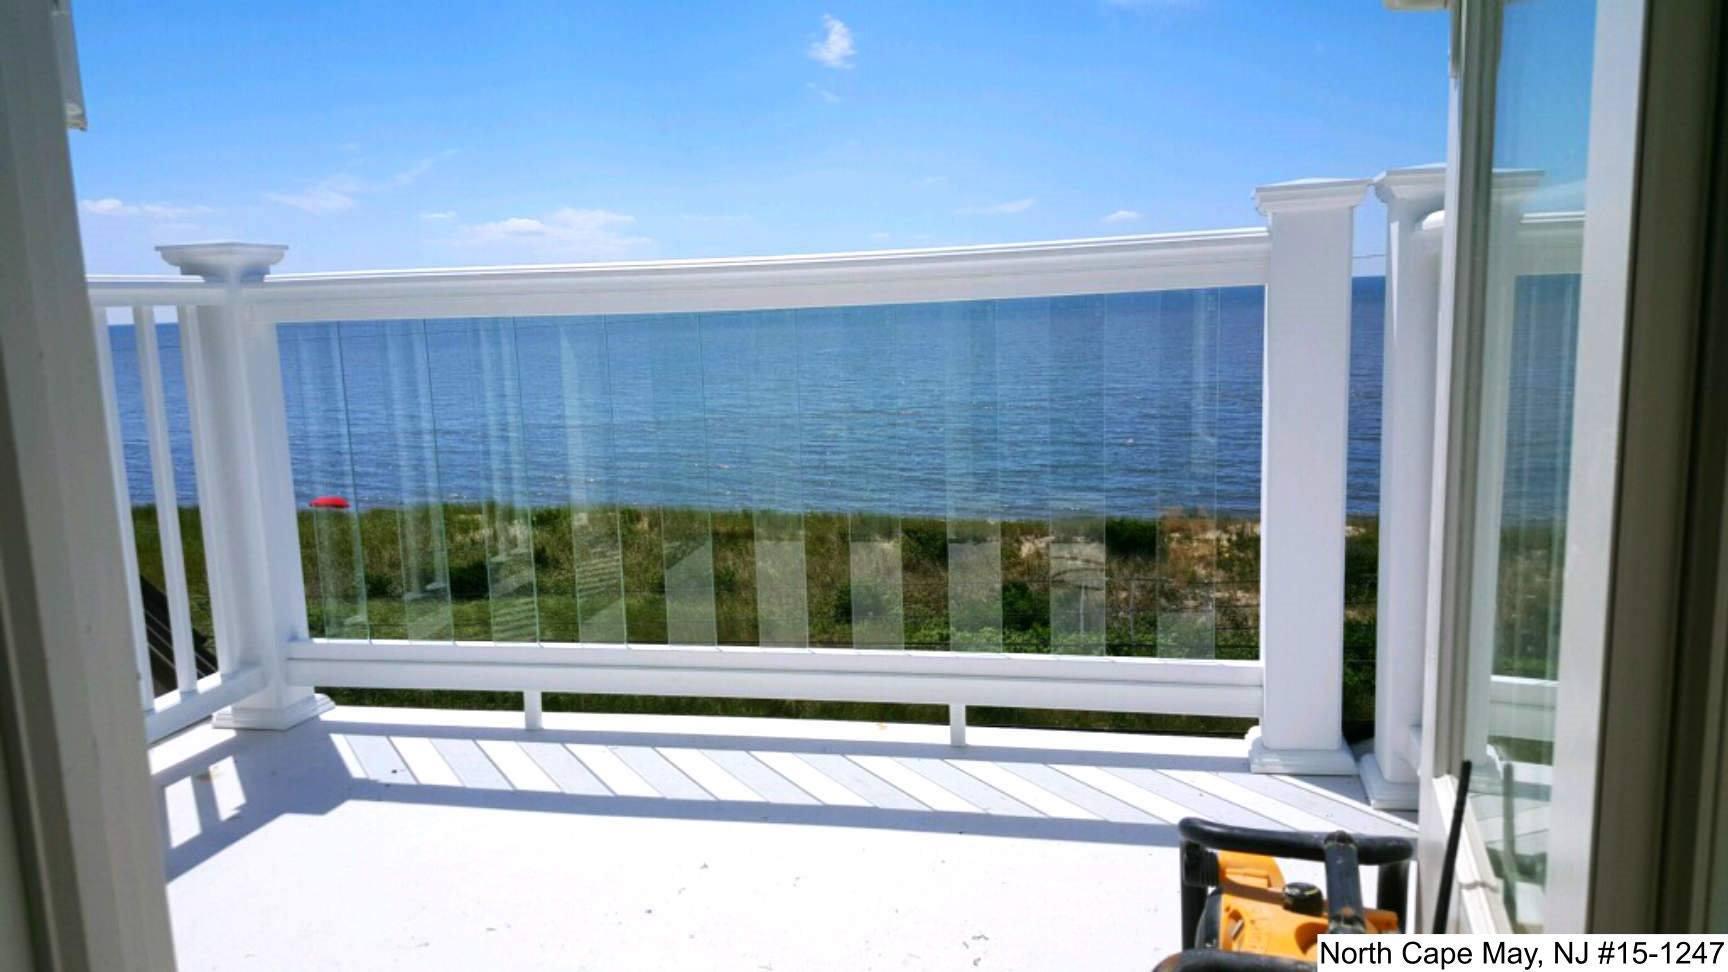 Glass Panel Vinyl Railing installed on a balcony